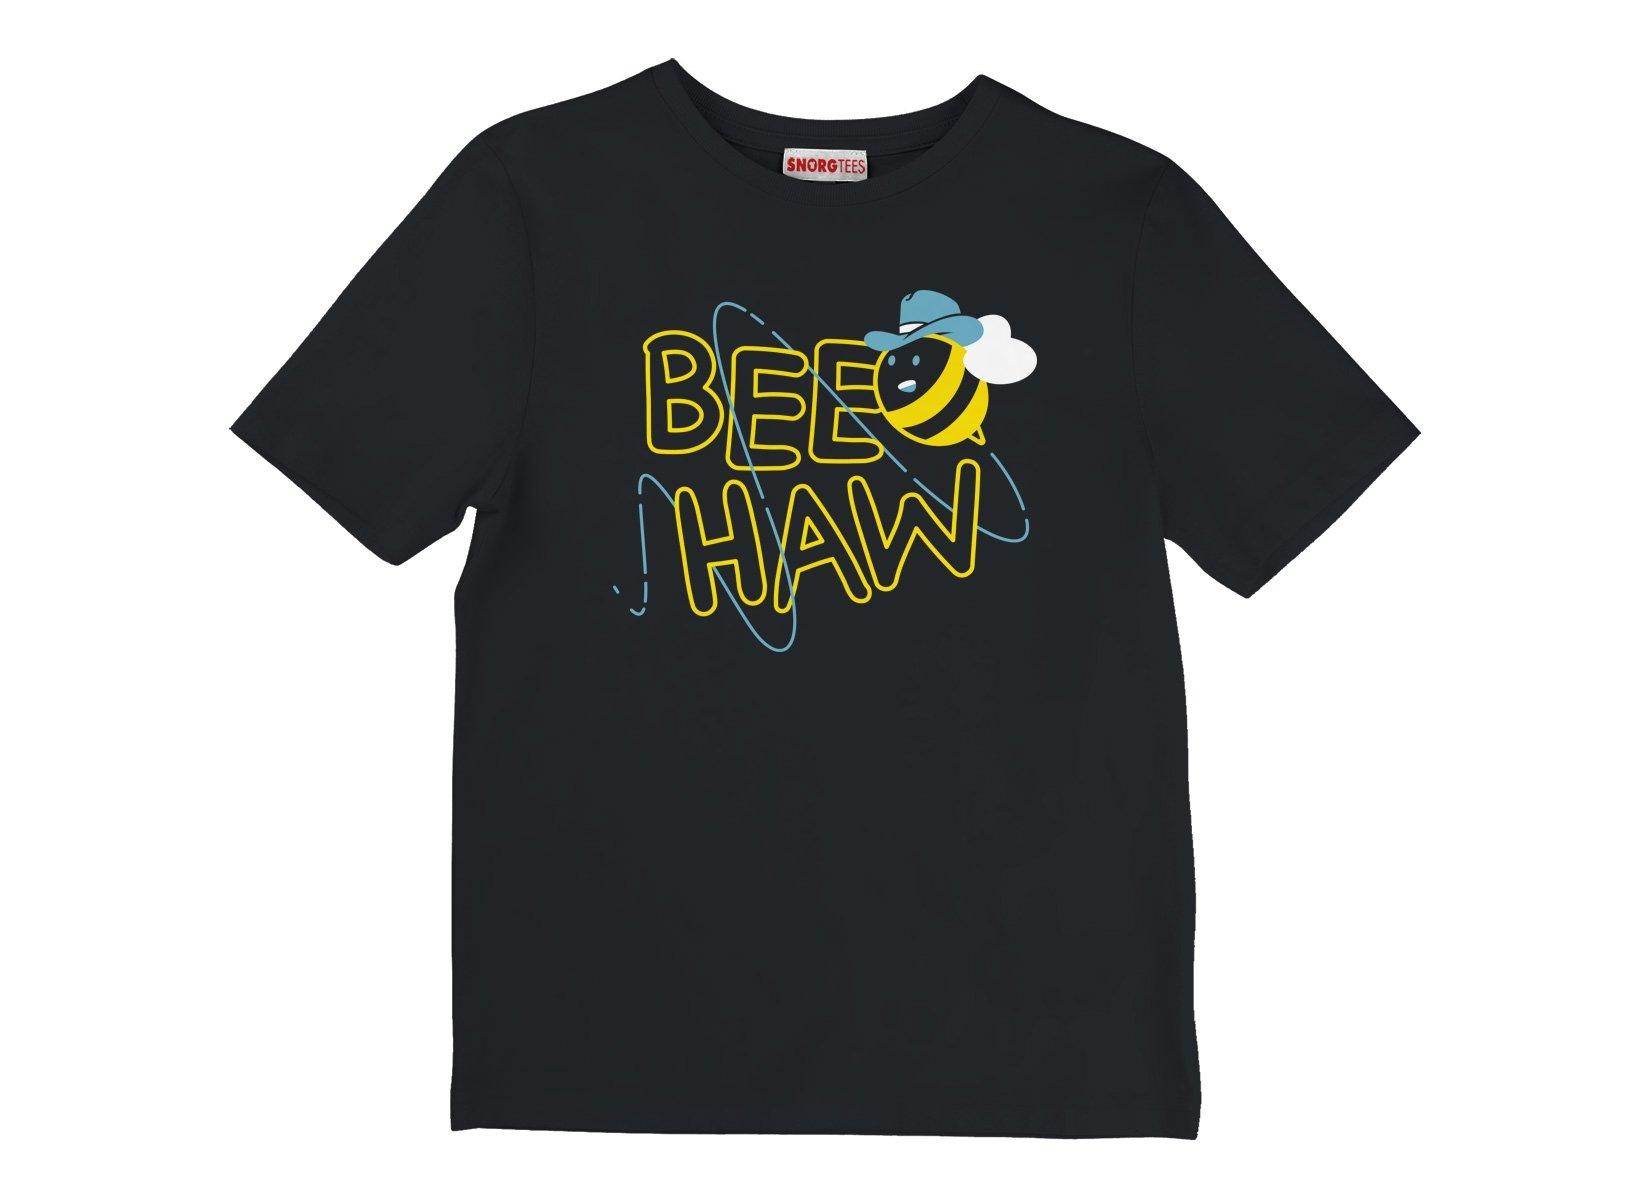 Bee Haw on Kids T-Shirt